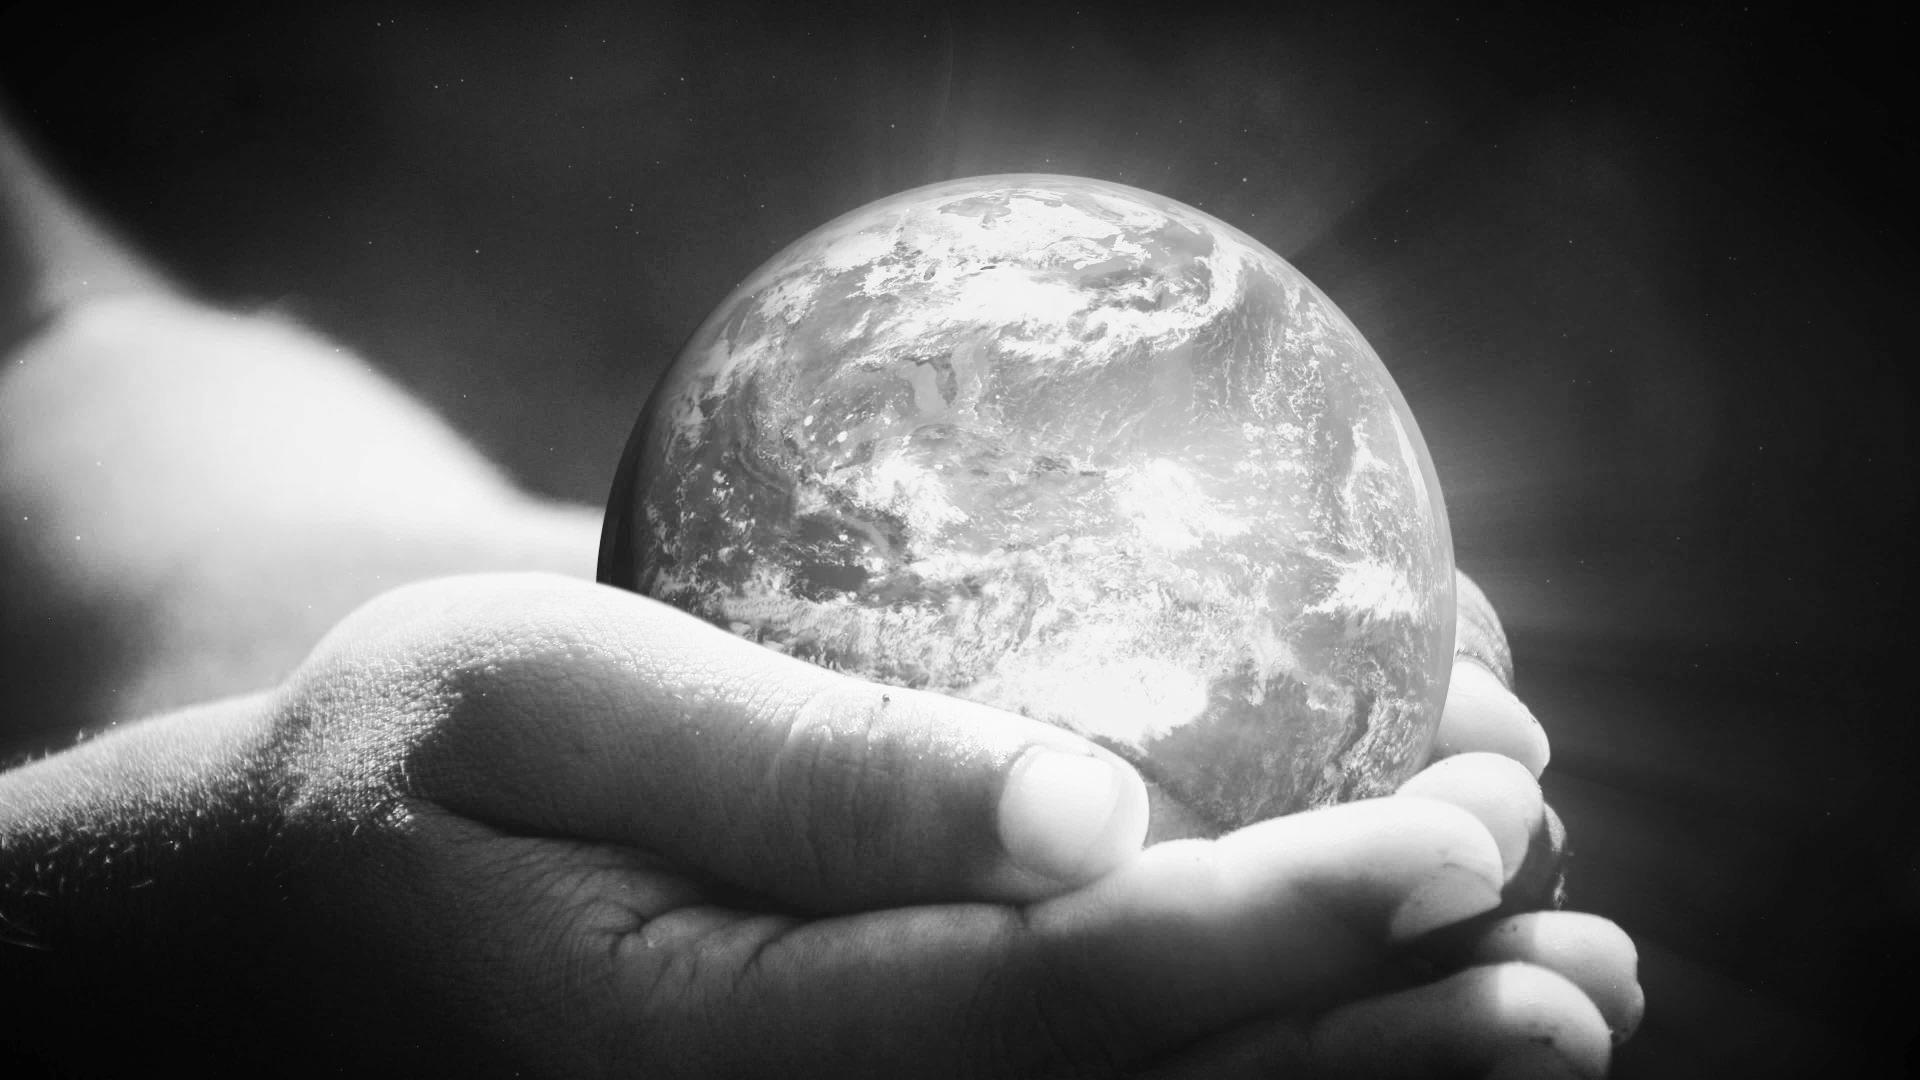 earth-spinning-in-a-boys-hands.jpg